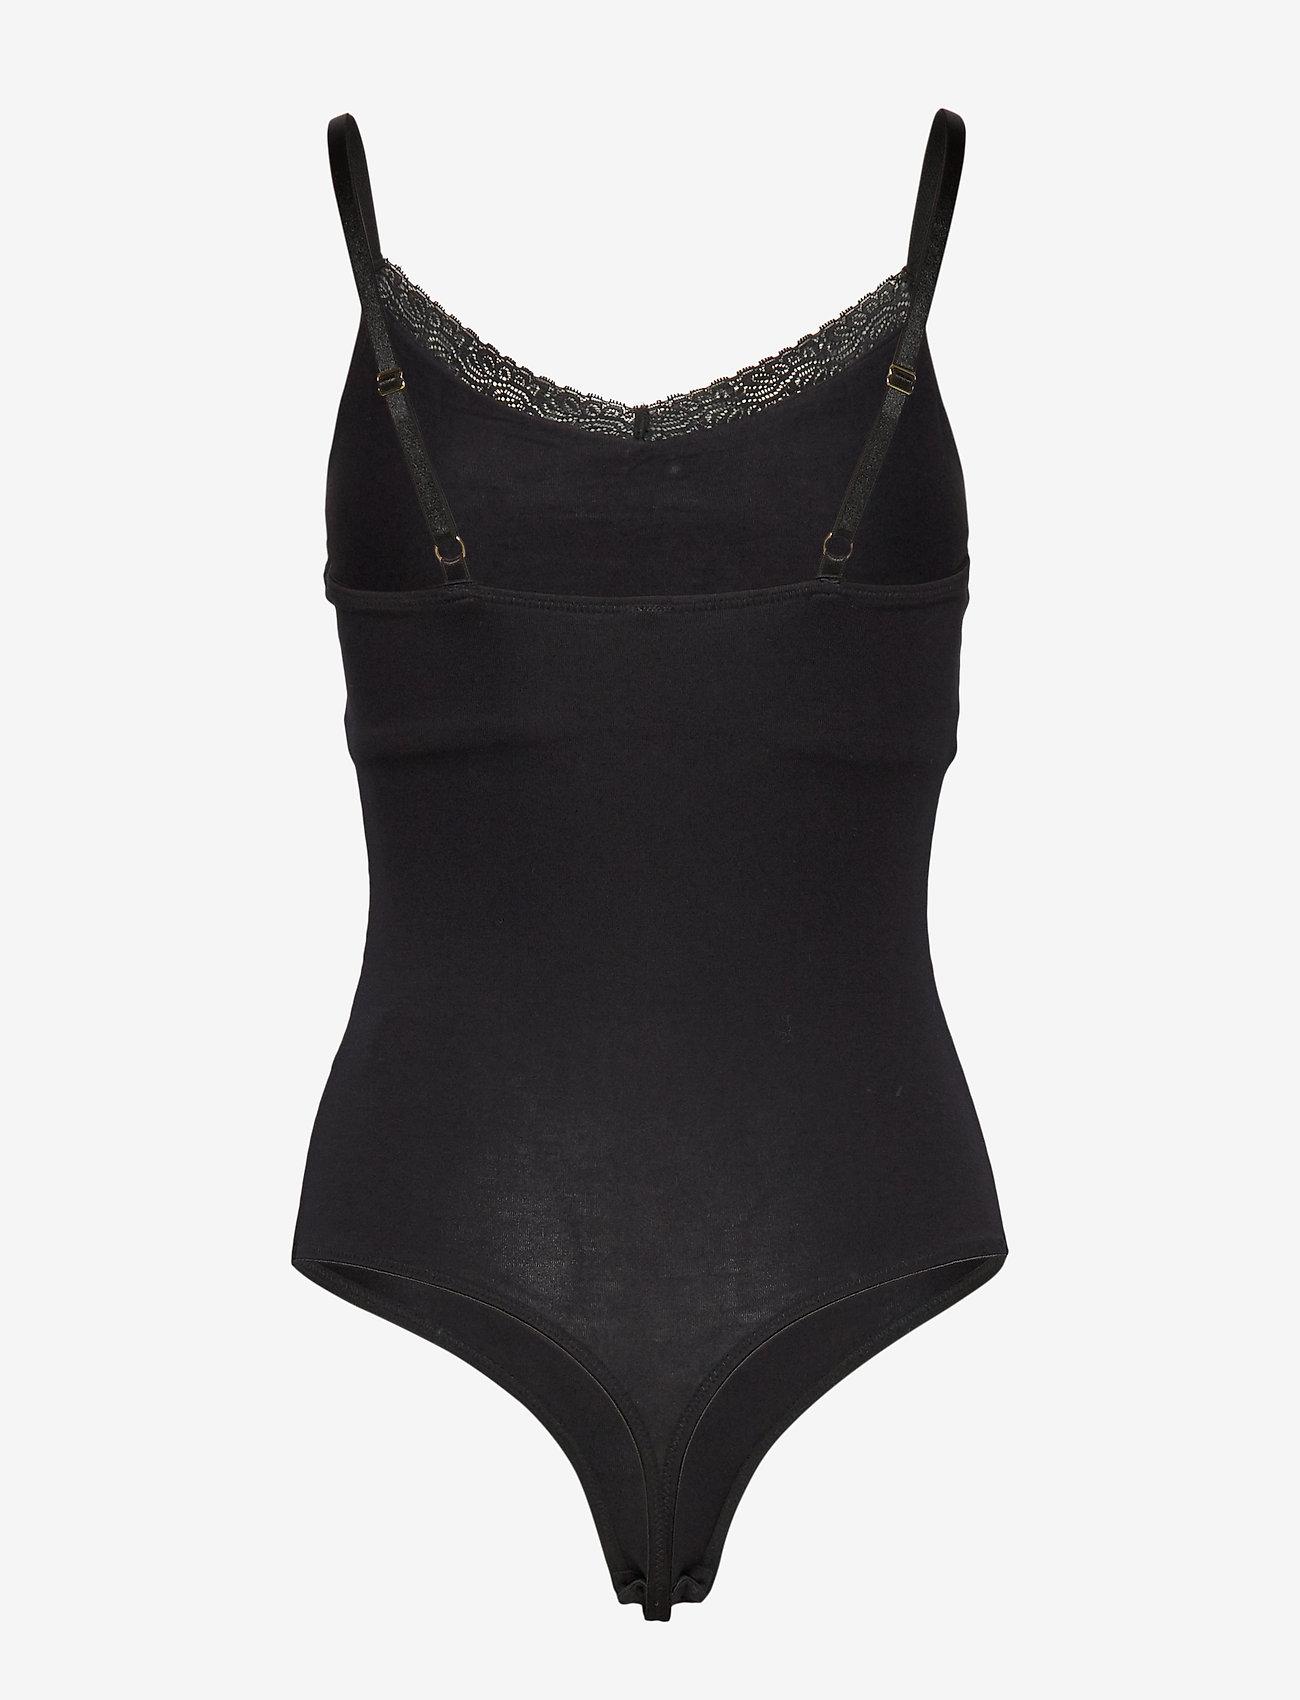 Underprotection - Bea body - bodies & slips - black - 1